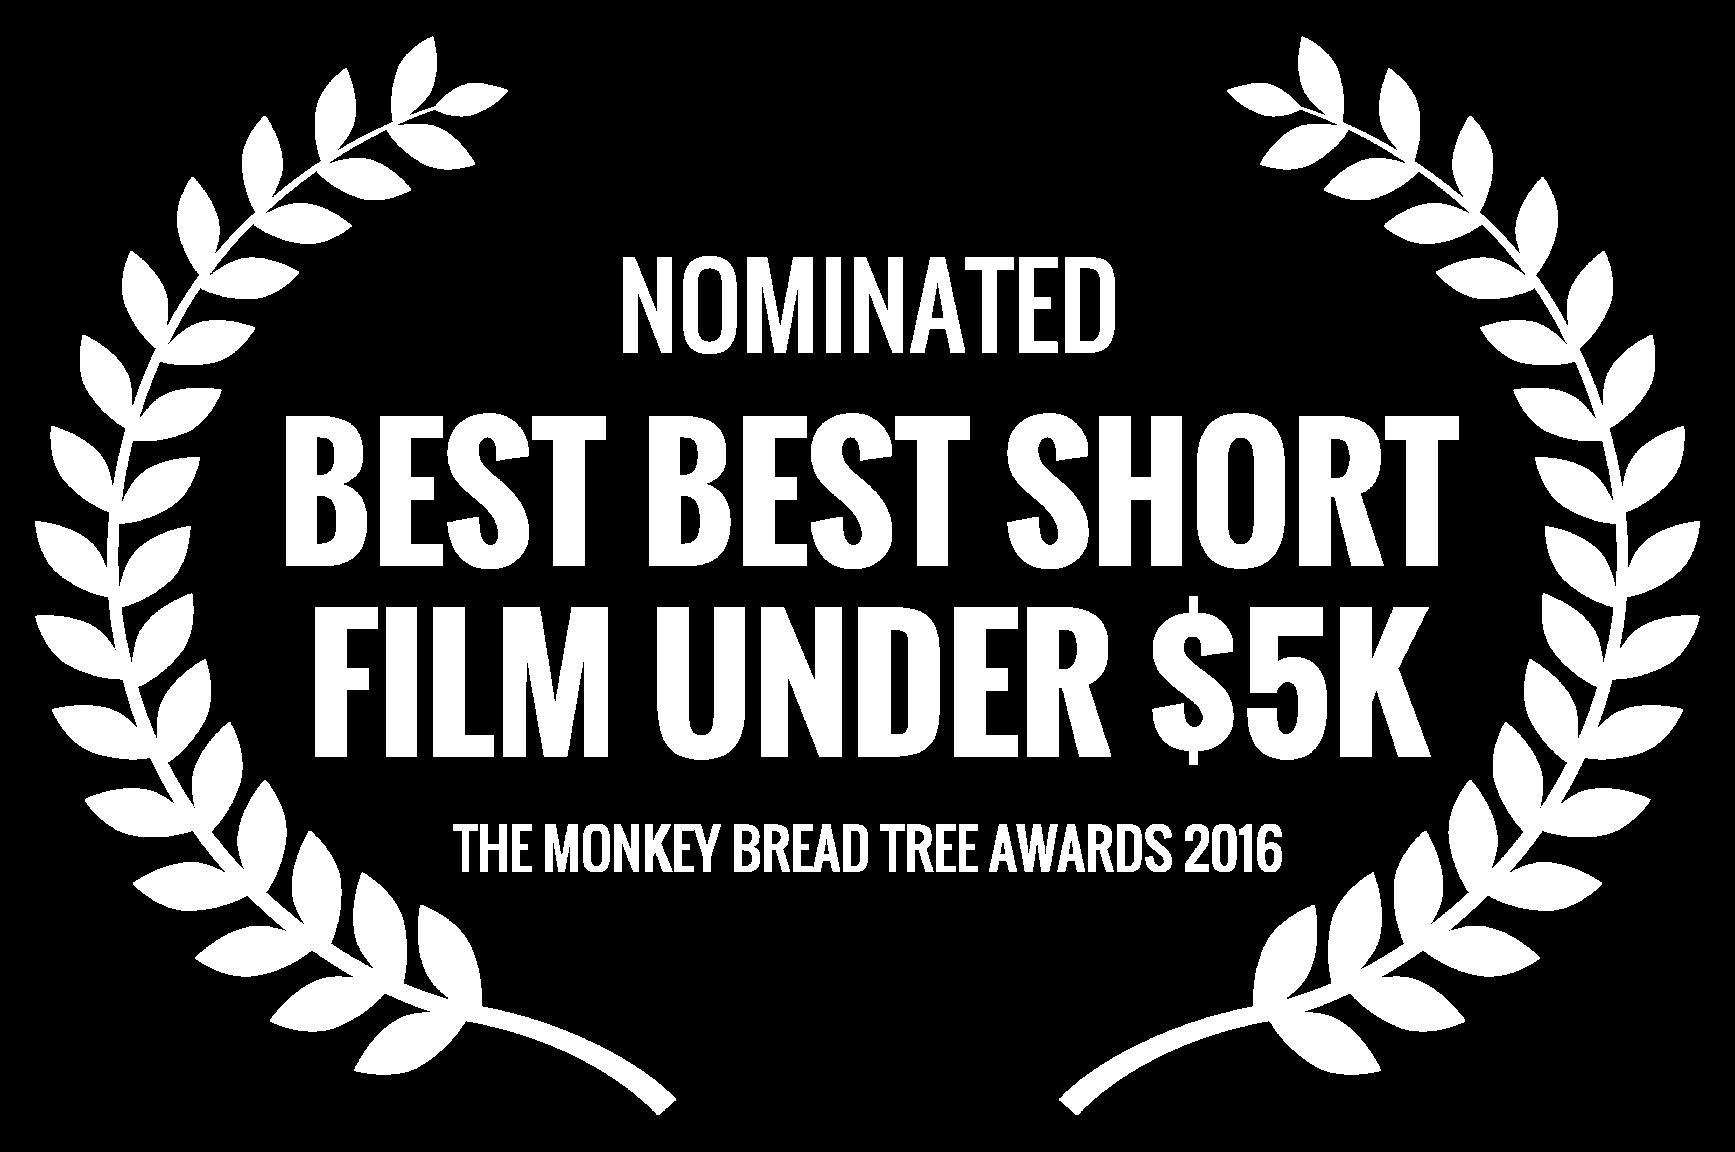 NOMINATED - BEST BEST SHORT FILM UNDER 5K - THE MONKEY BREAD TREE AWARDS 2016.png